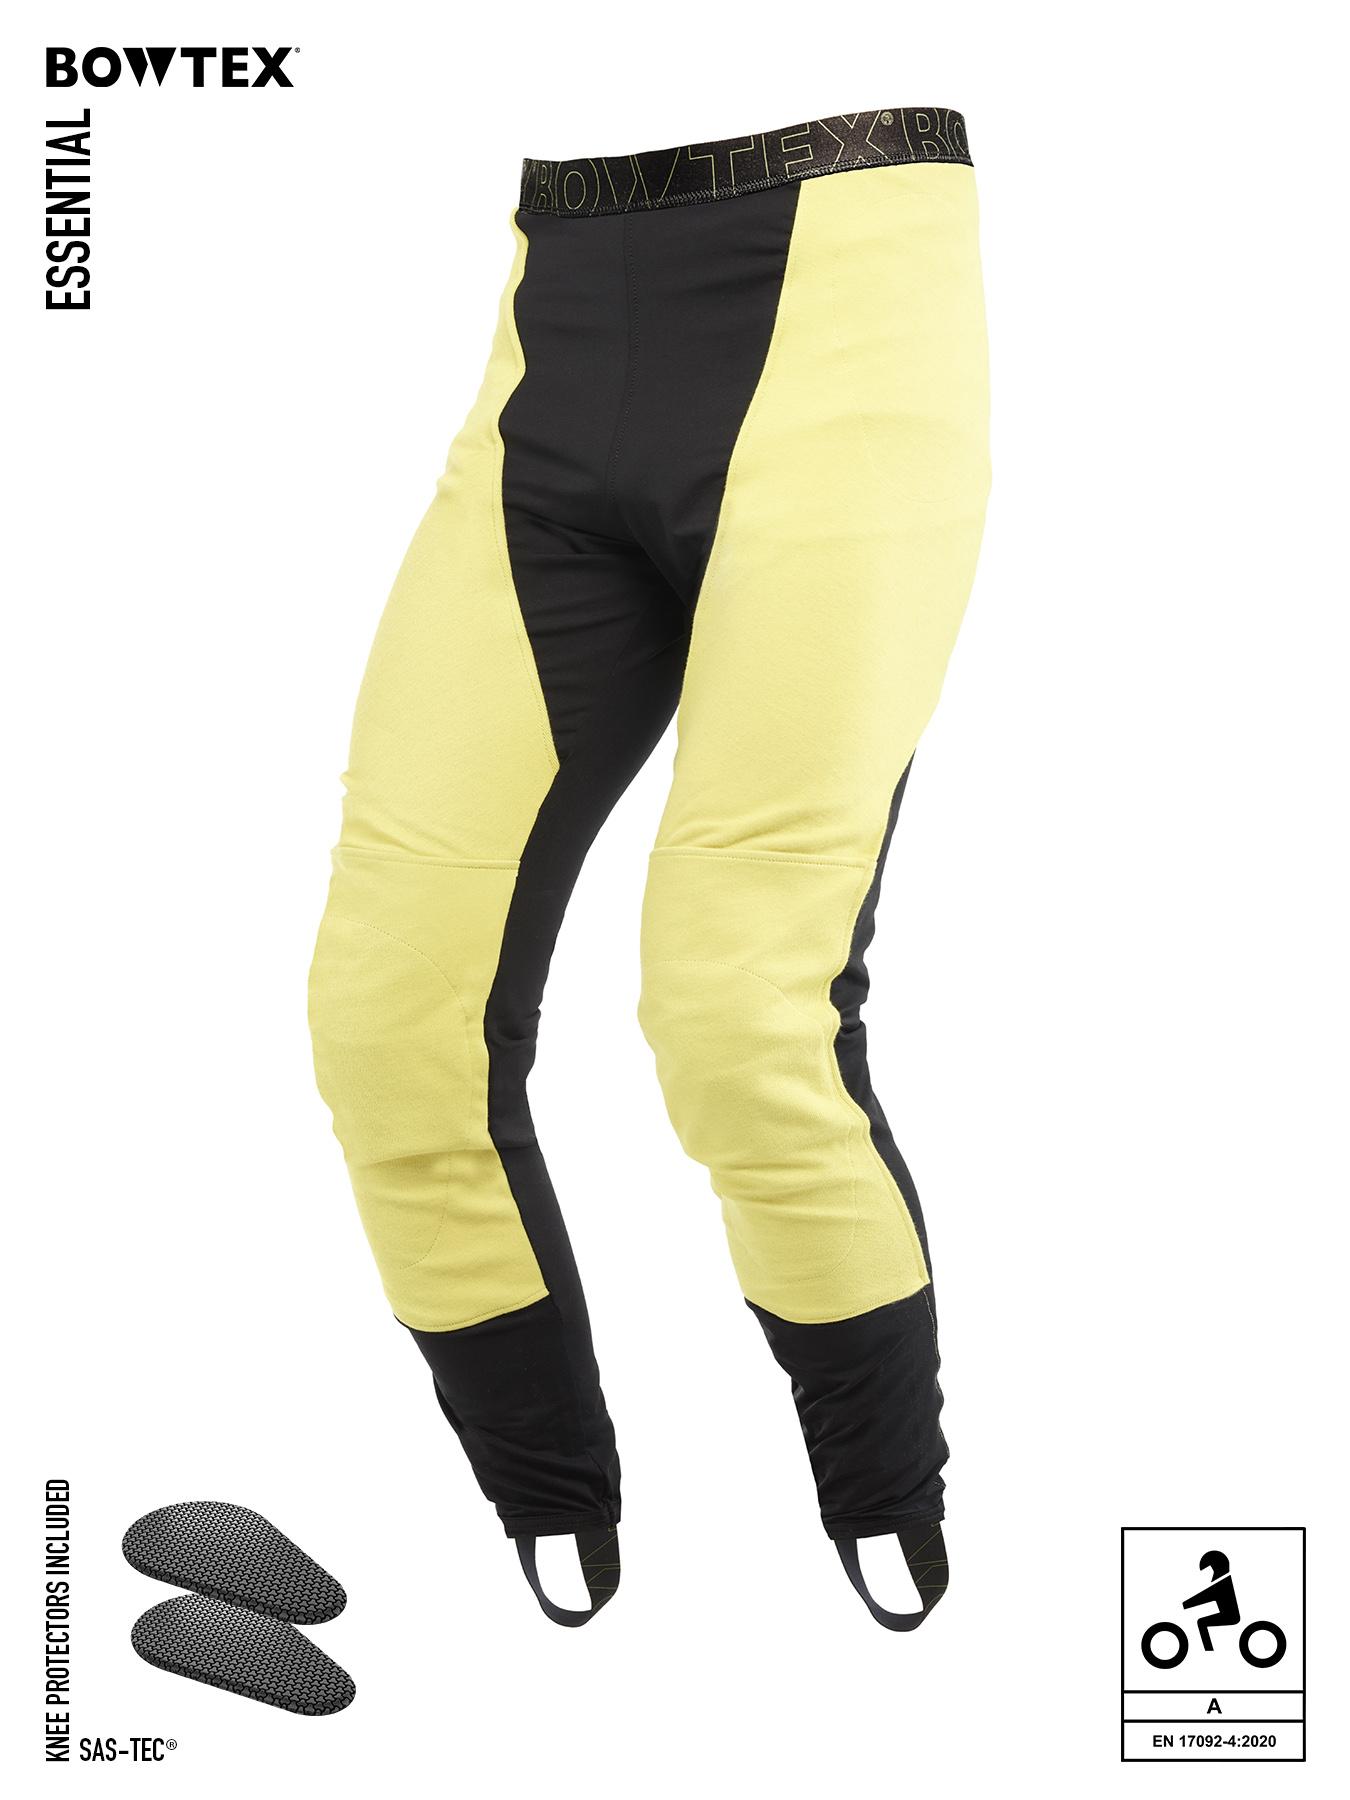 Bowtex essential legging moto protection ce